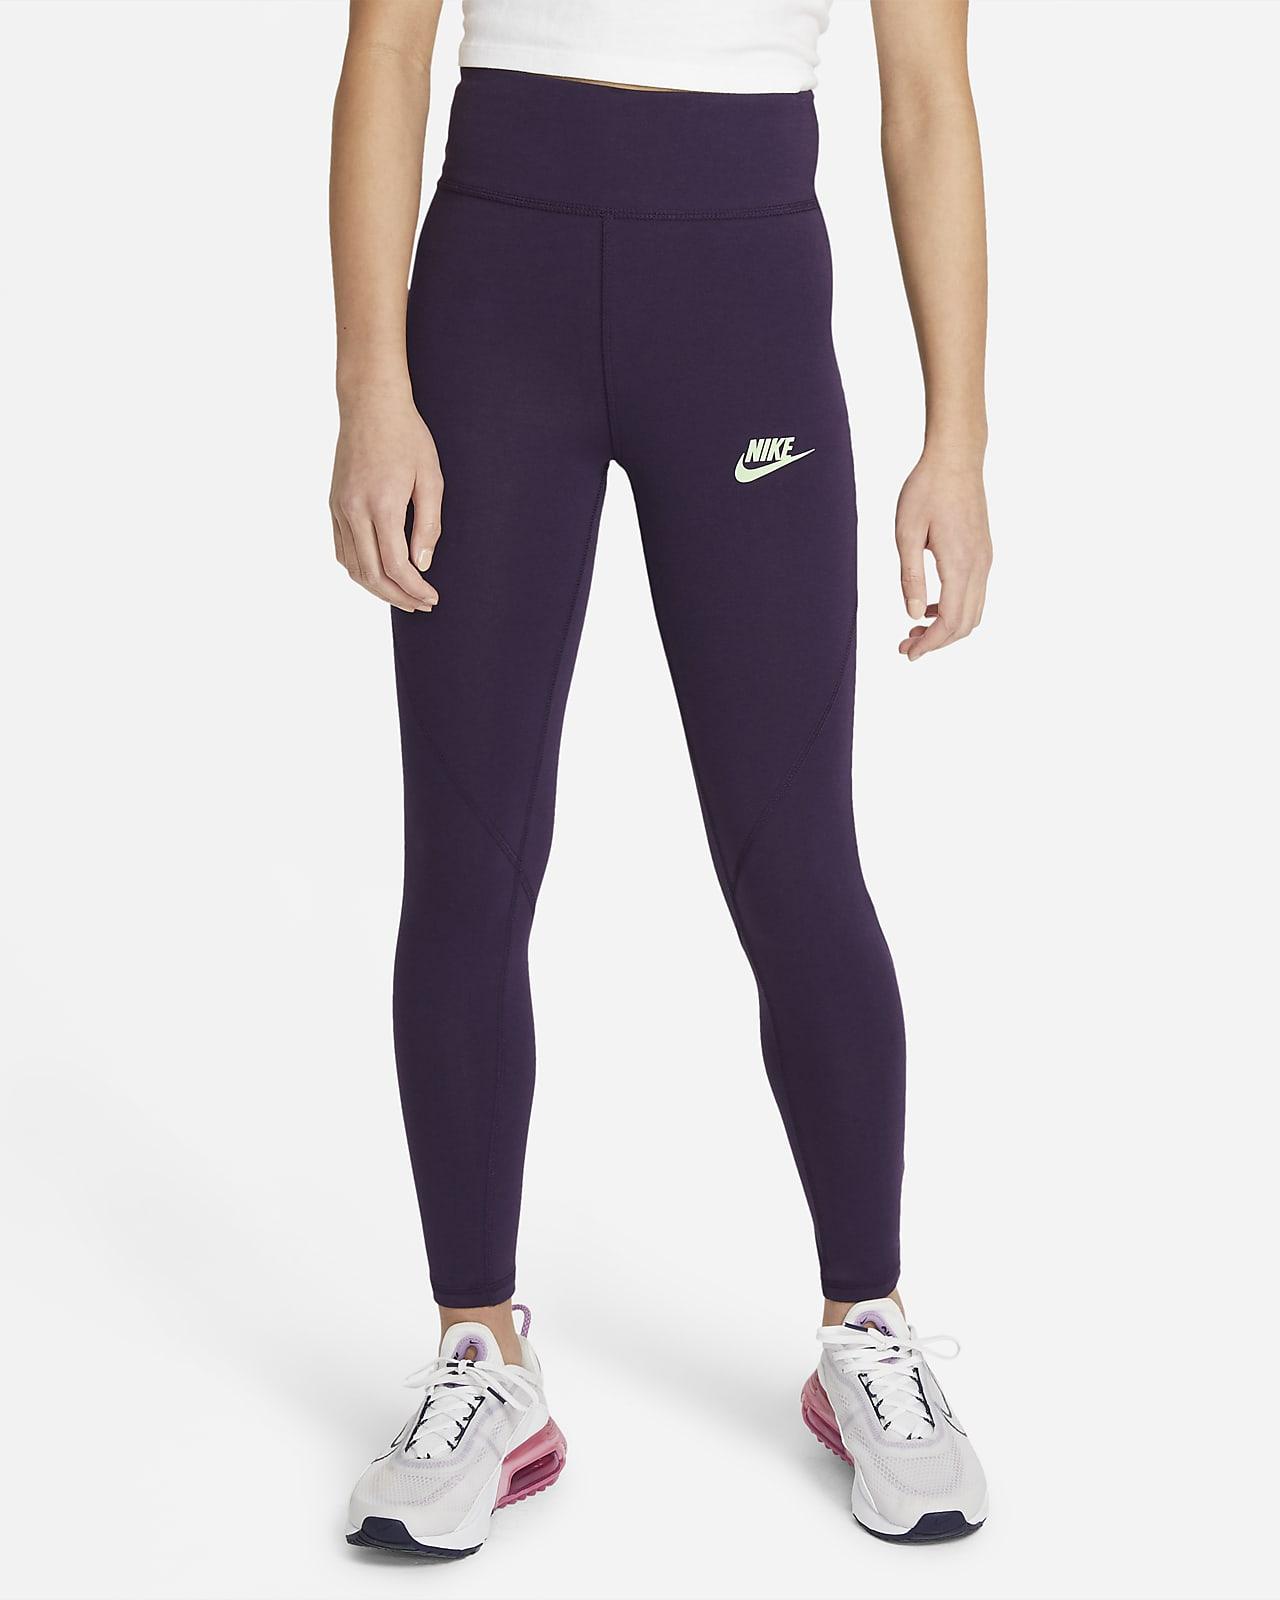 Leggings de cintura alta para niñas talla grande Nike Sportswear Favorites